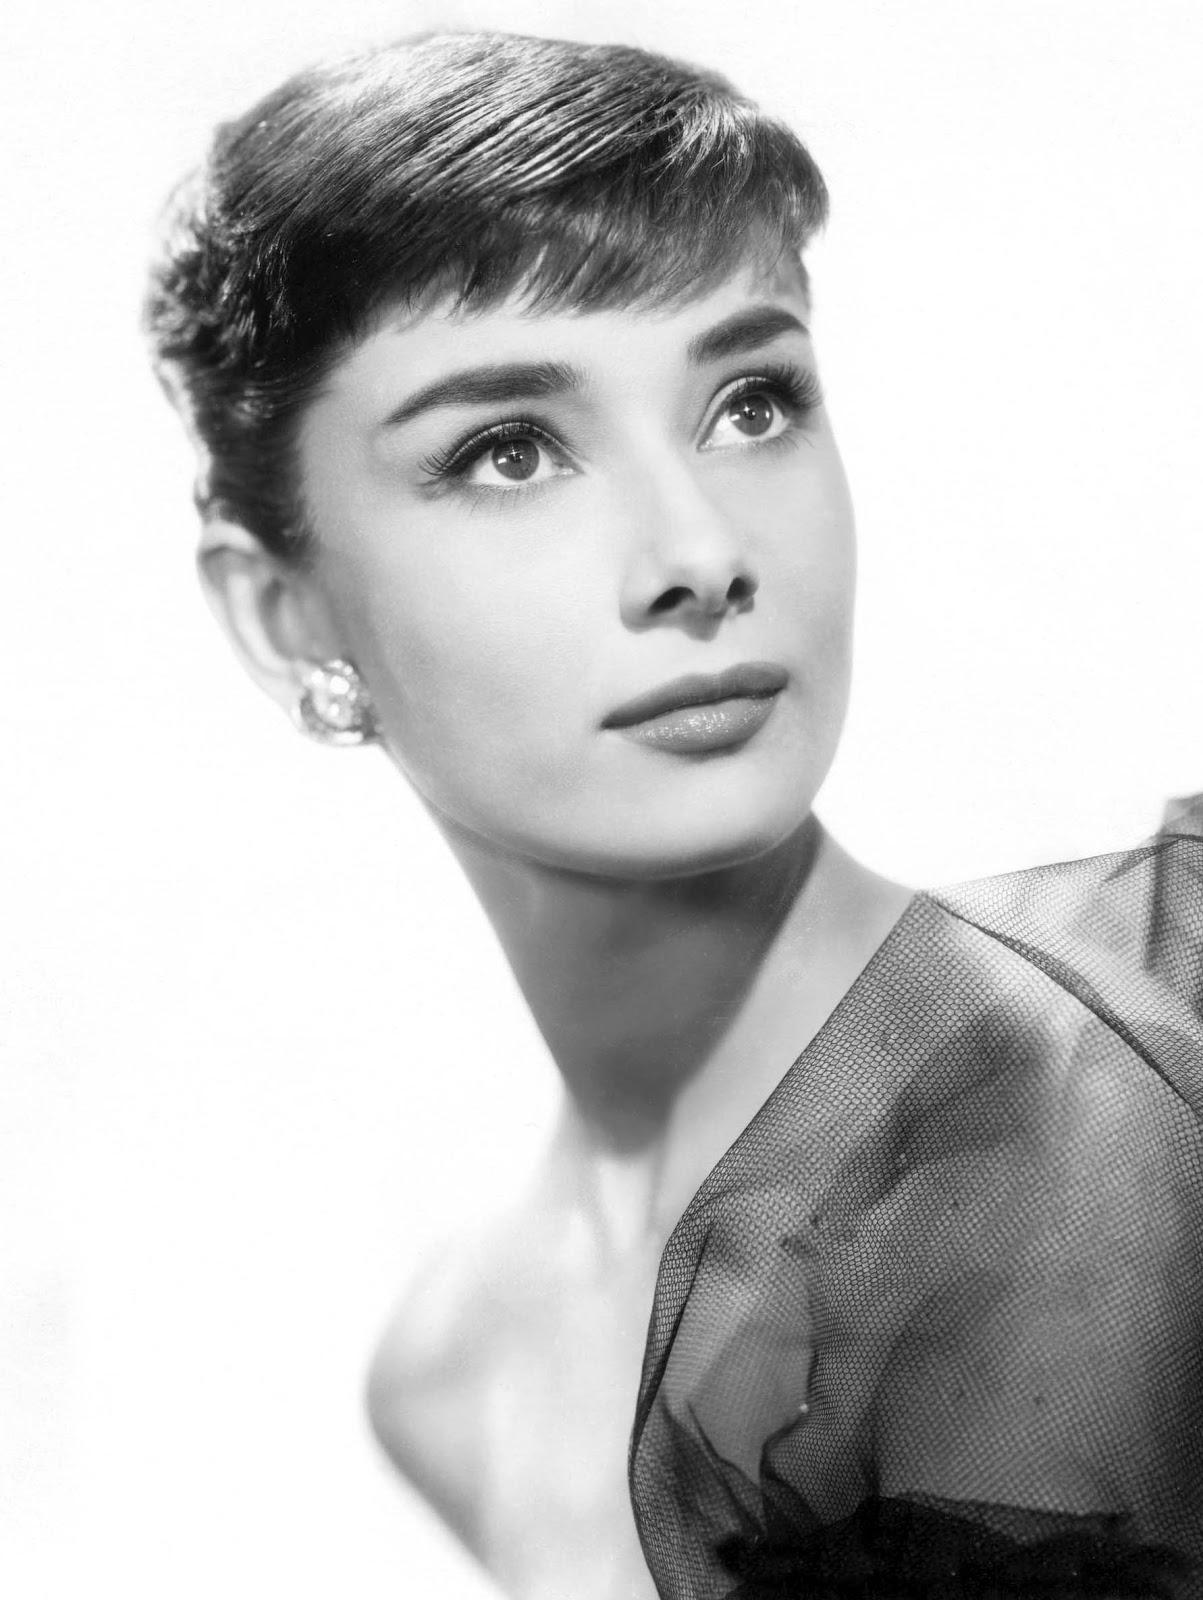 Le frasi di Audrey Hepburn più famose tratte dai film e dalla  - audrey hepburn frasi in inglese